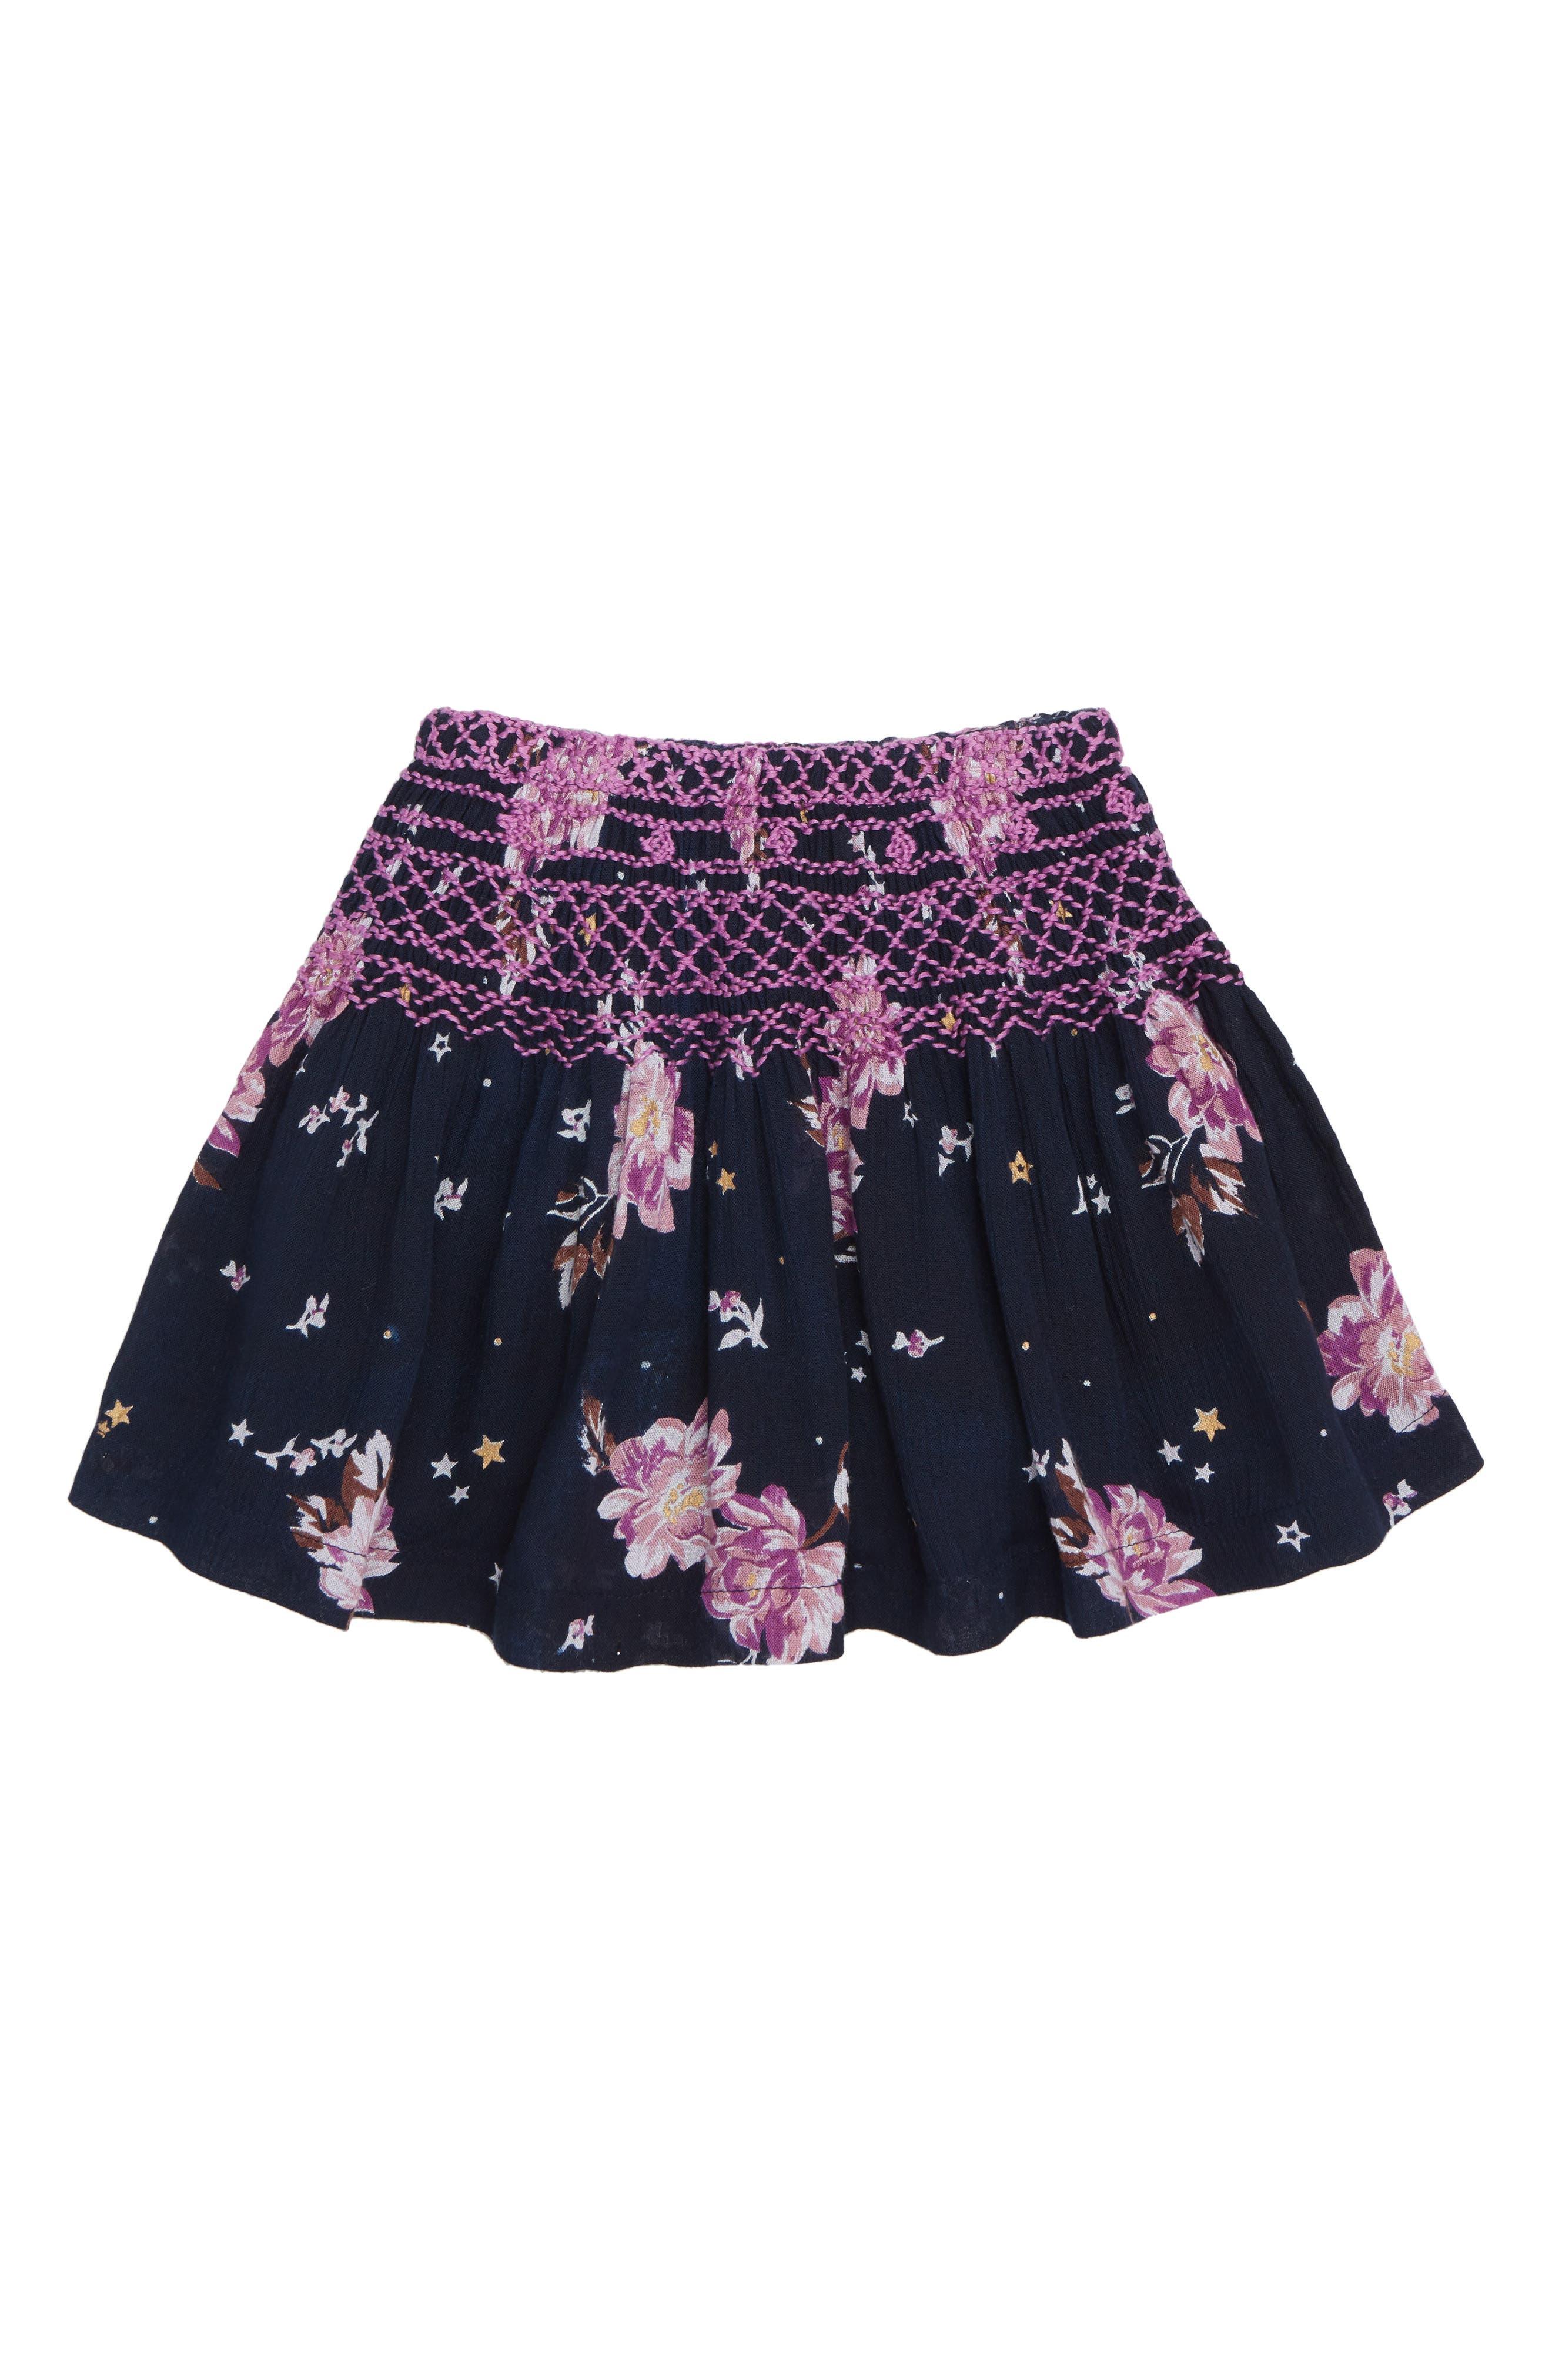 Pixie Skirt,                             Main thumbnail 1, color,                             NAVY